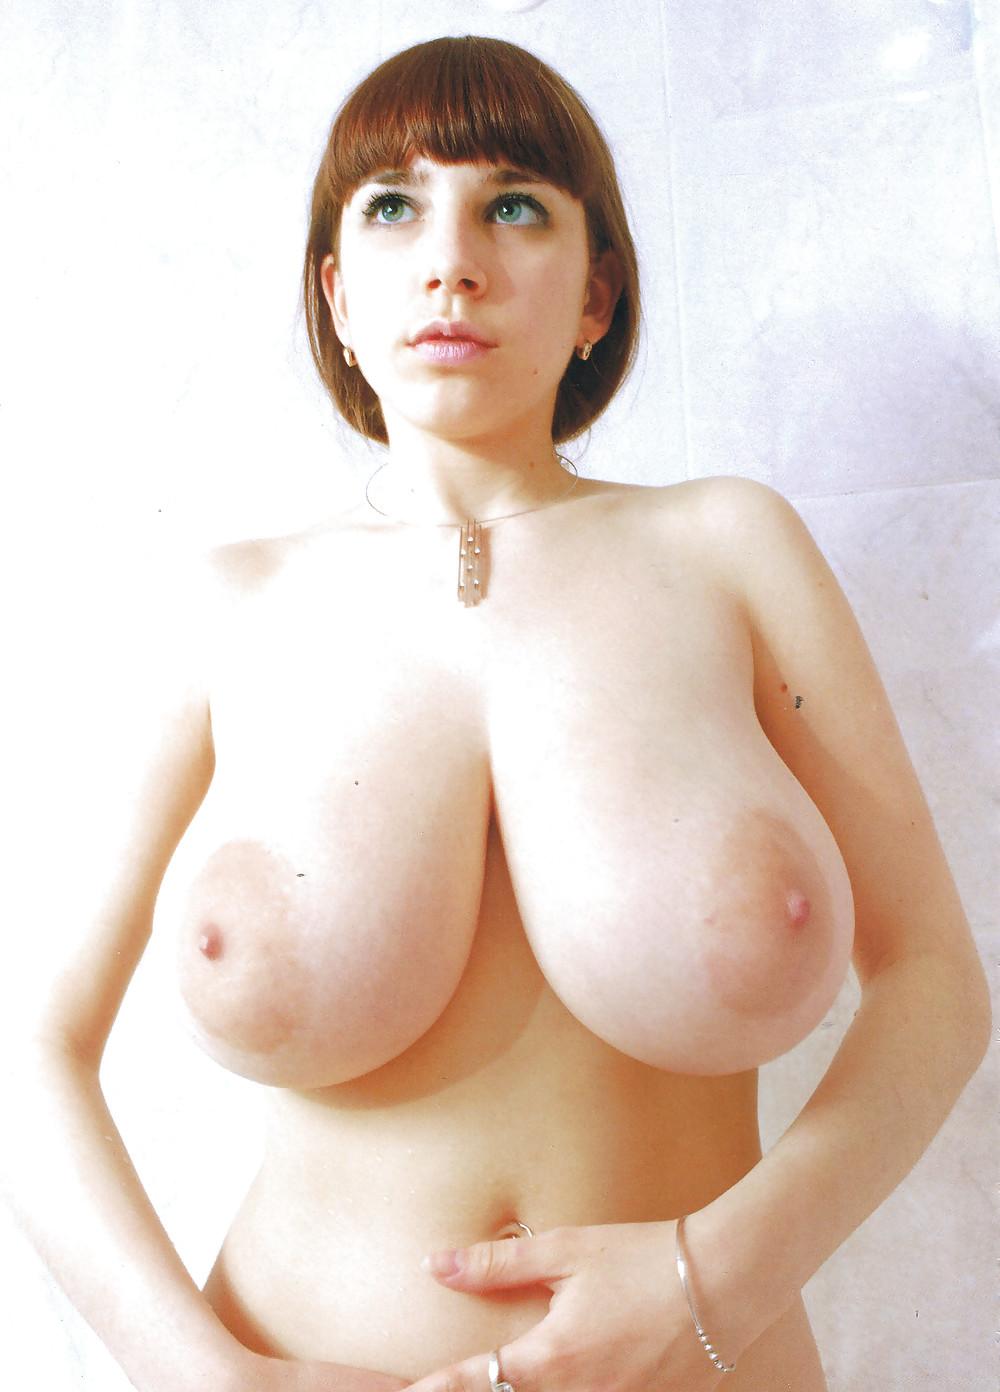 Busty russian pornstar jordan pryce goes black